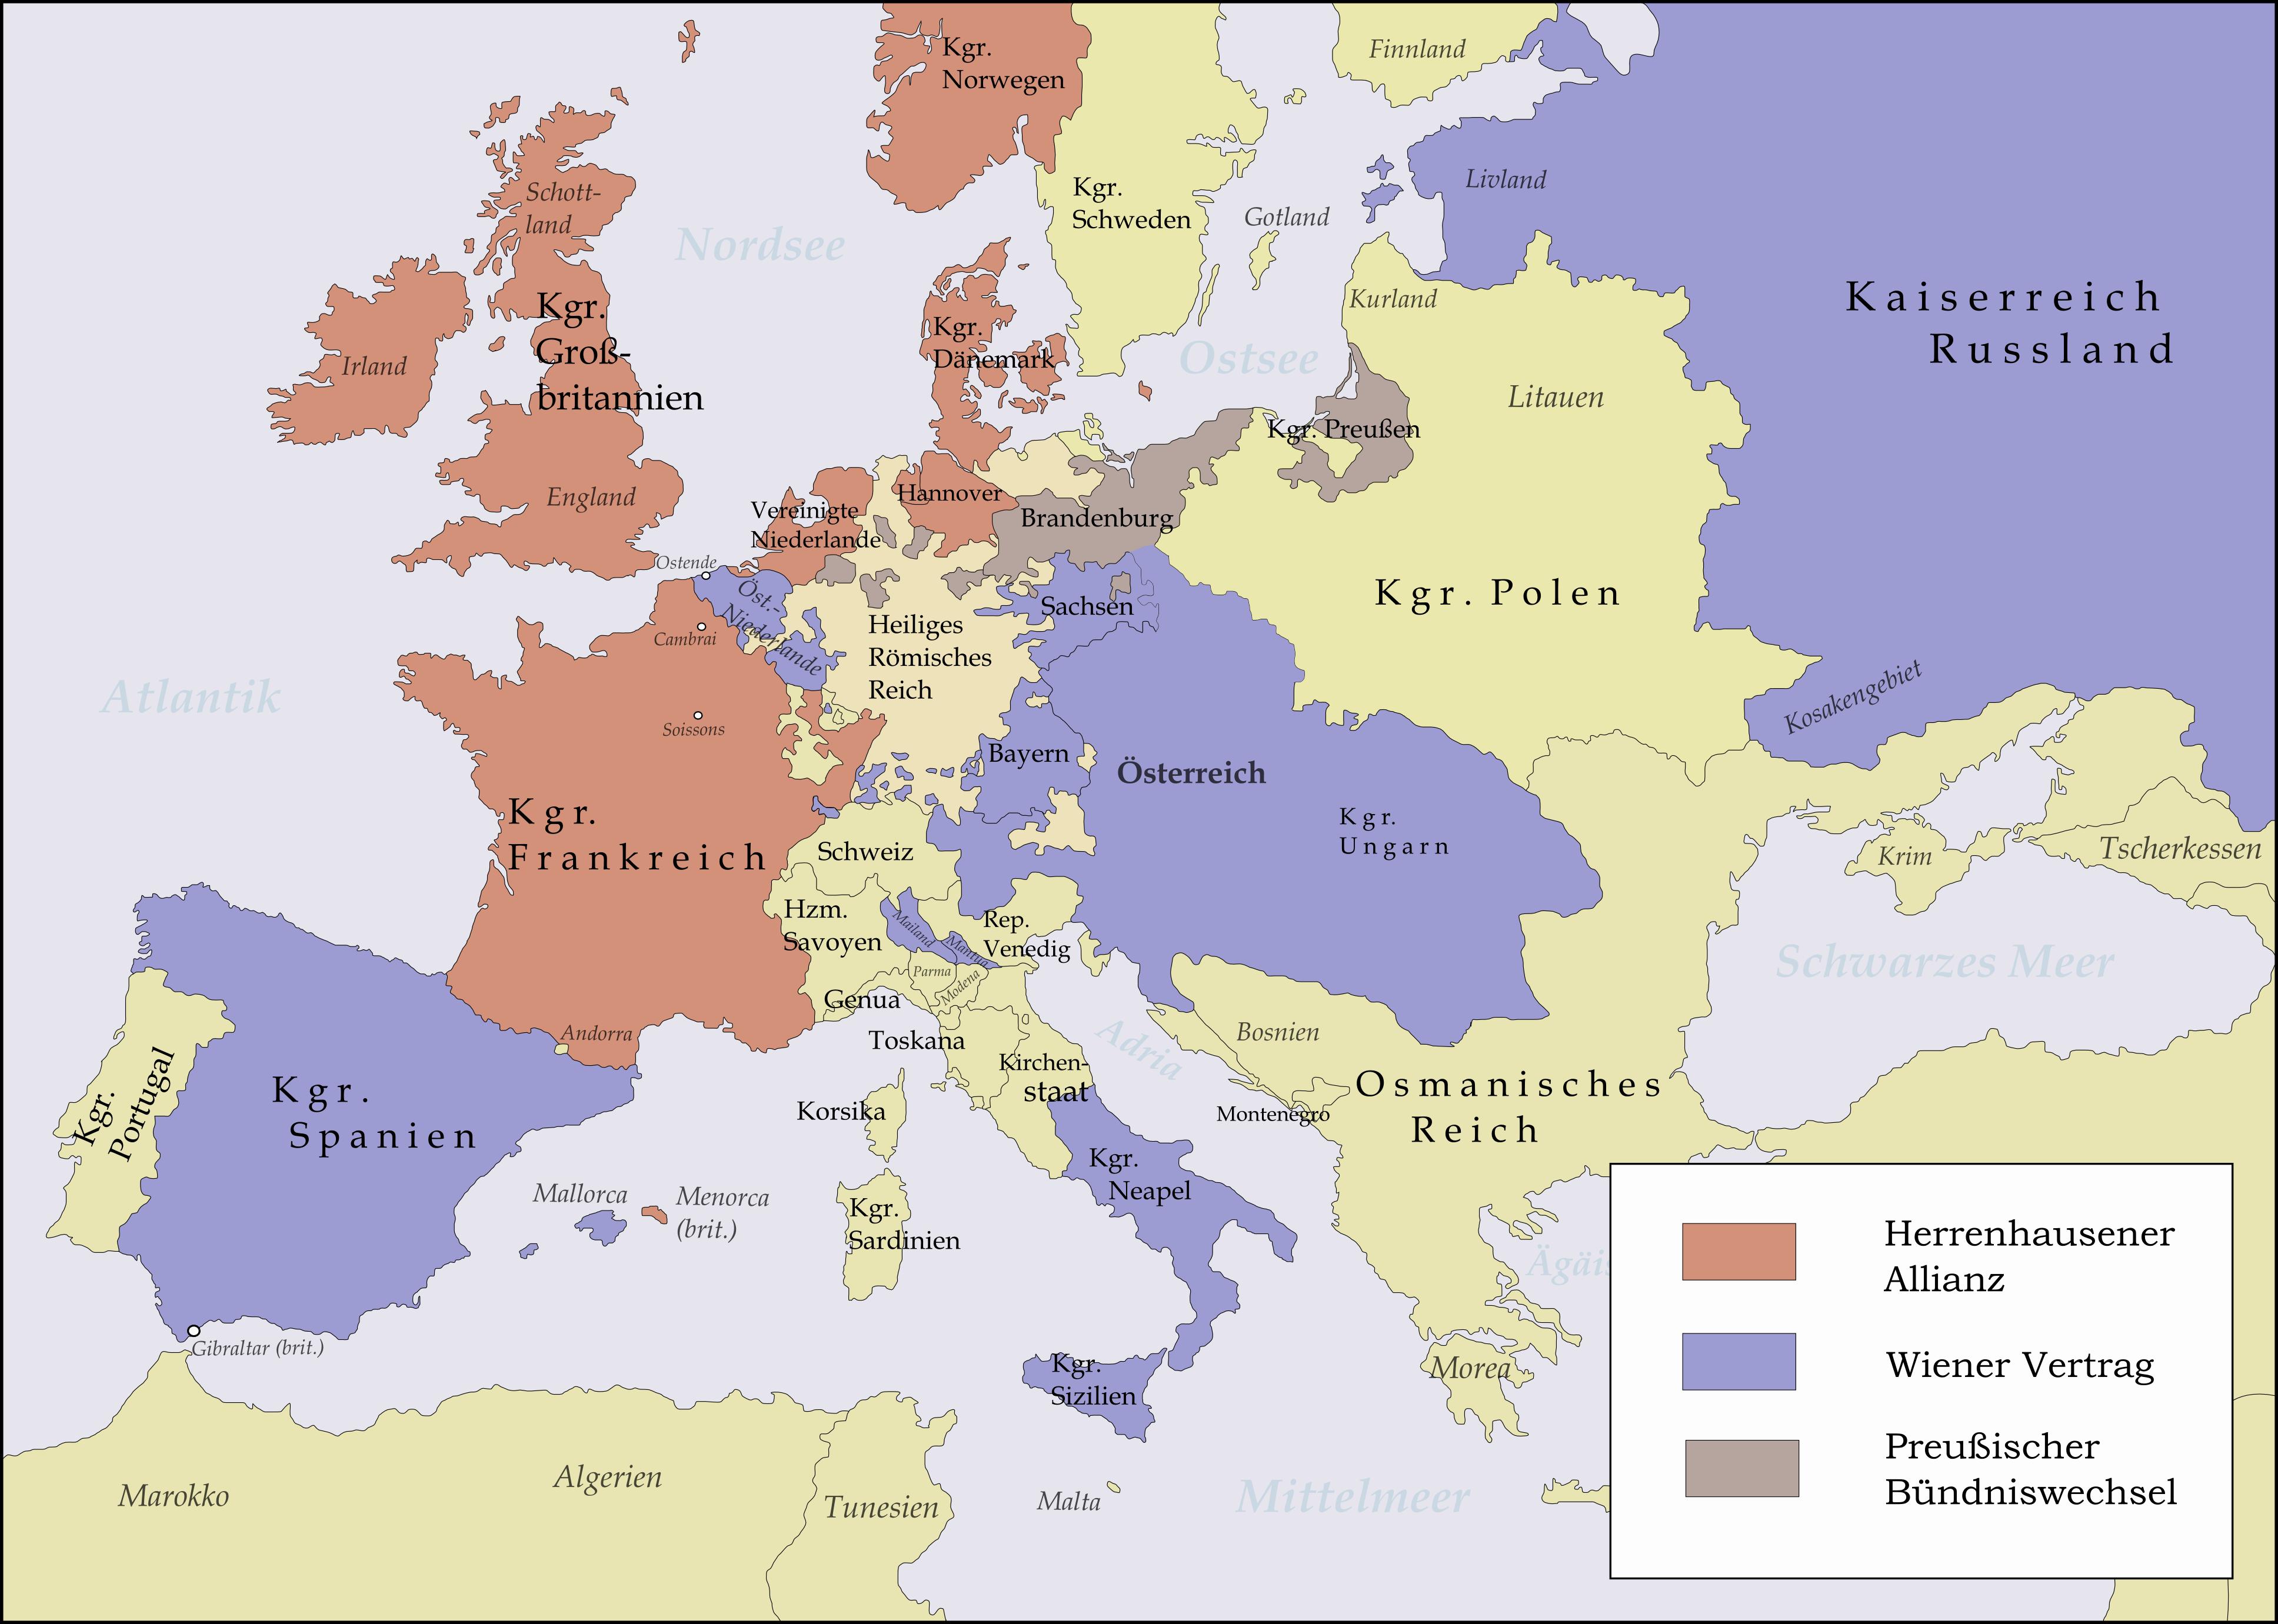 Karte Von Europa.Datei Karte Bundnissysteme In Europa 1725 1730 Png Wikipedia